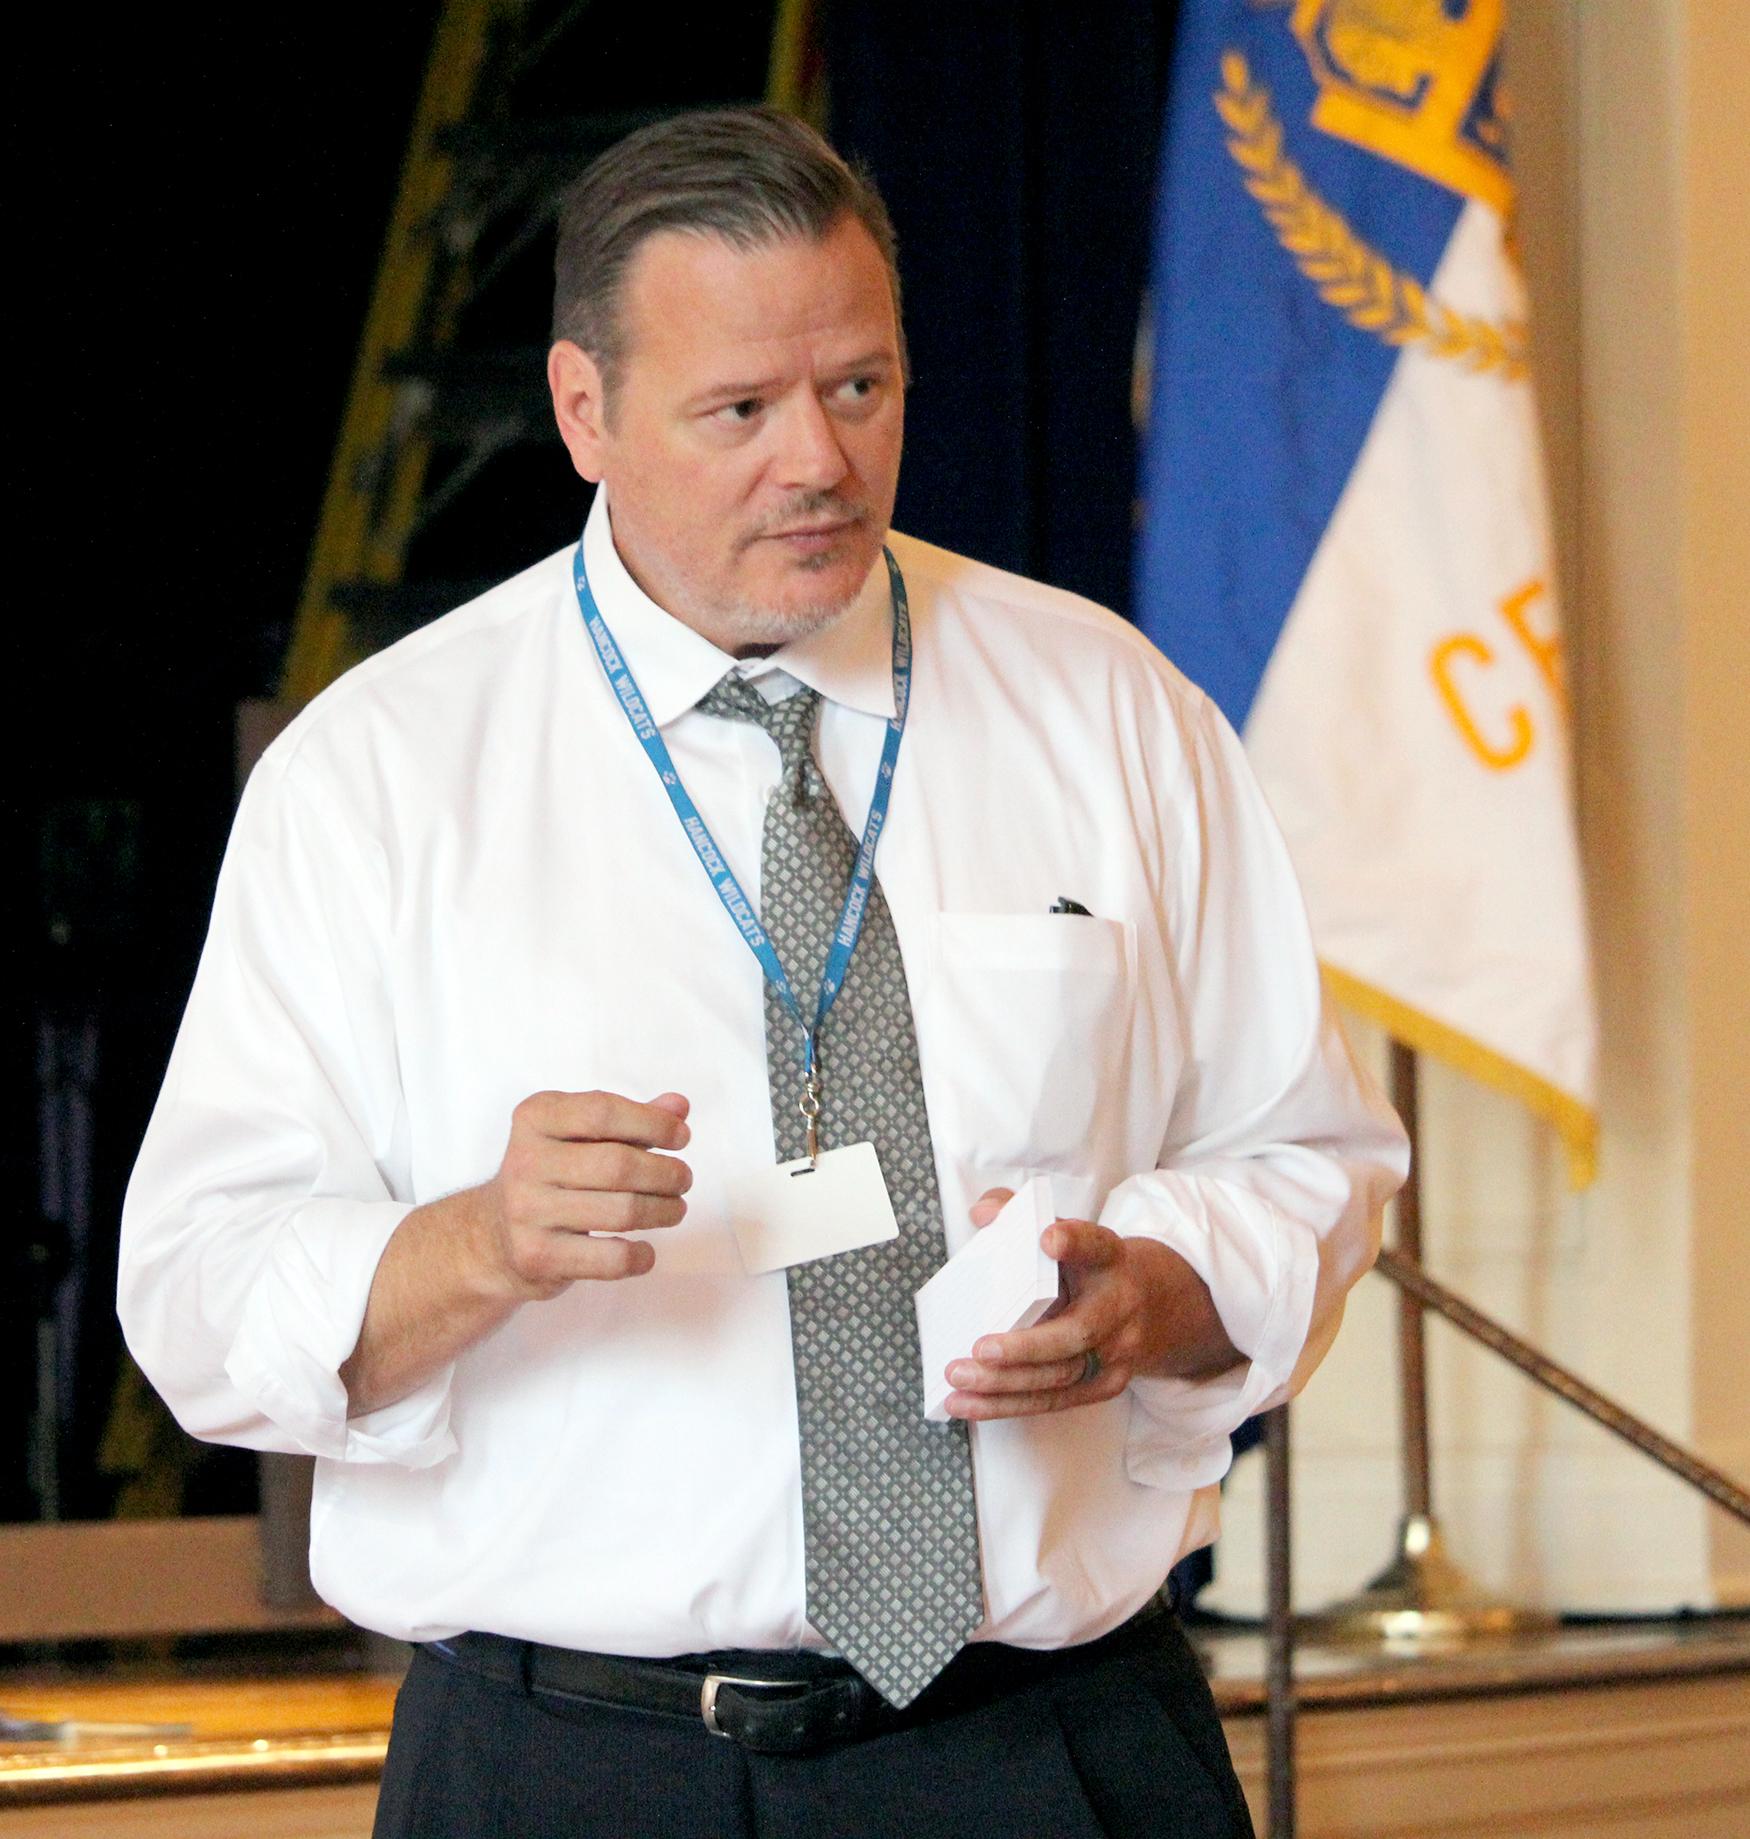 Superintendent Terry Dougherty